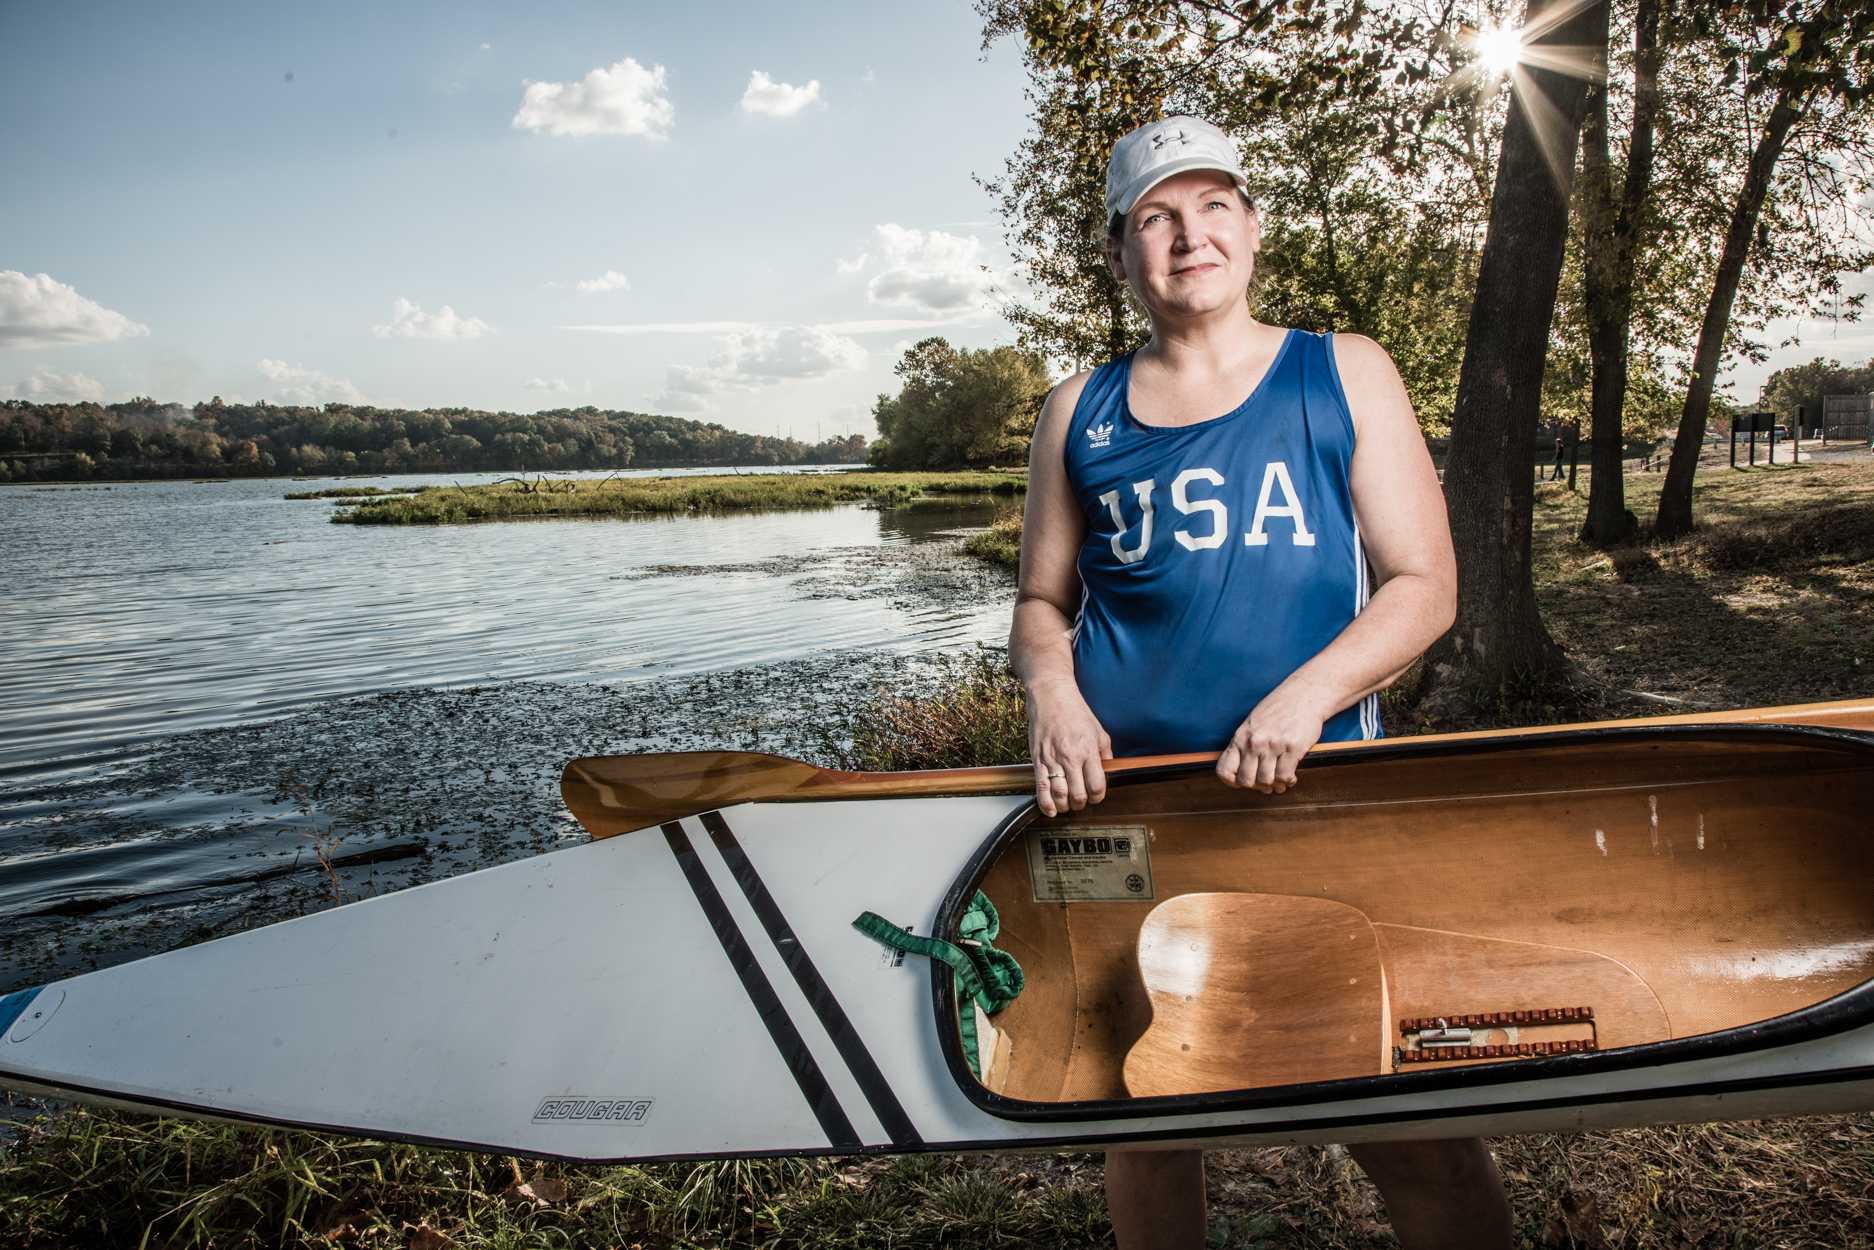 cancer survivor olympics kayak